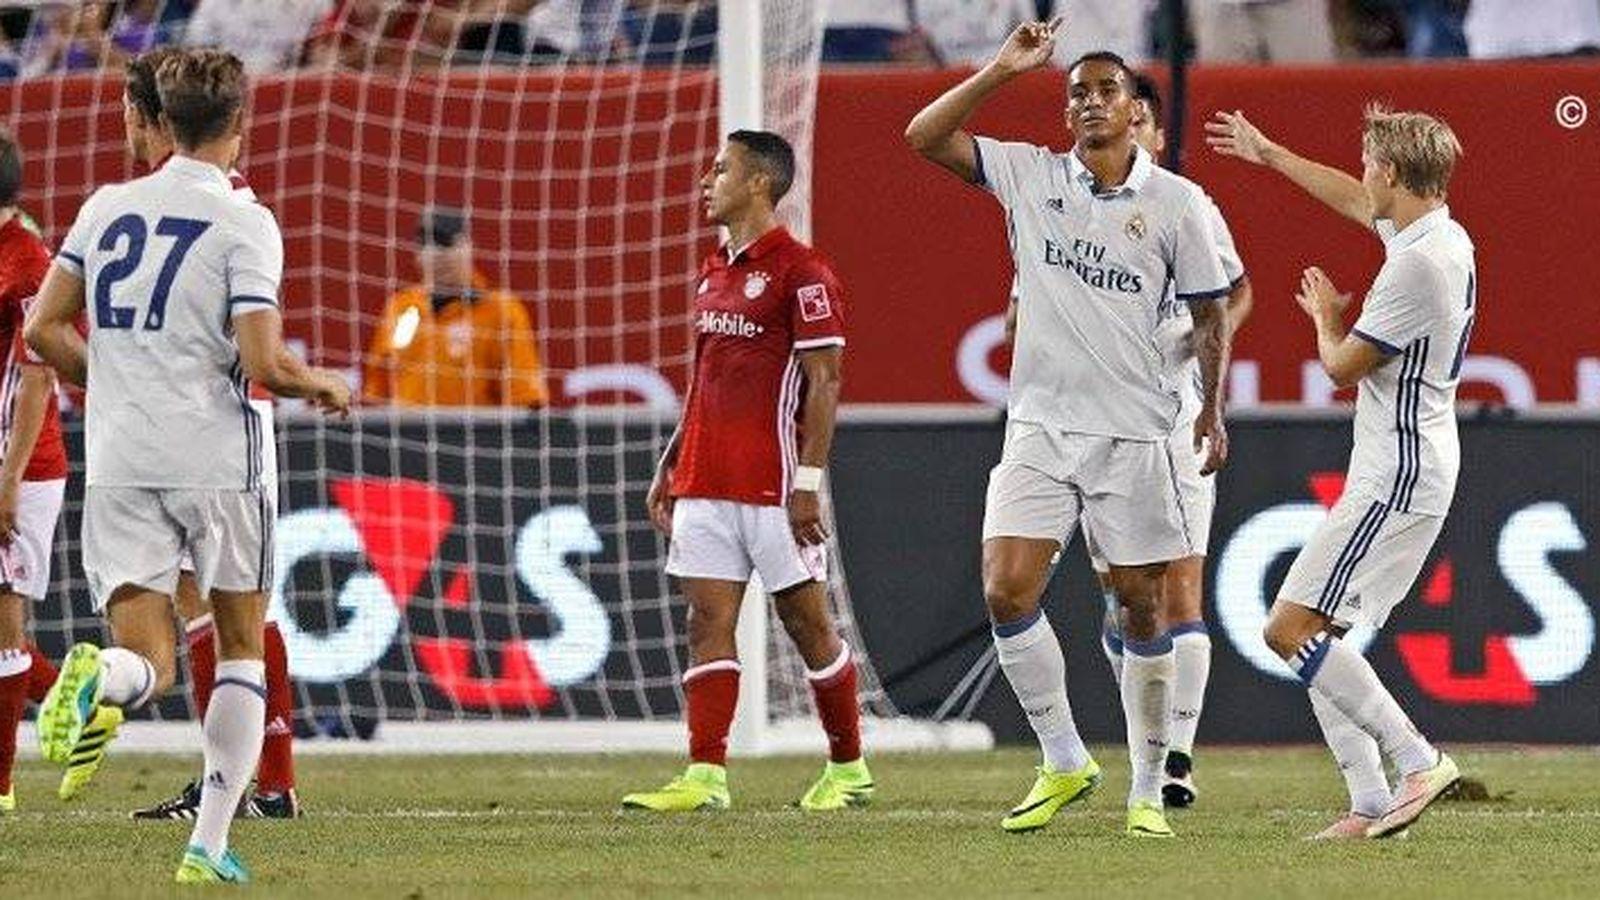 Foto: Danilo celebra su gol junto a Odegaard y Llorente (@RealMadrid).